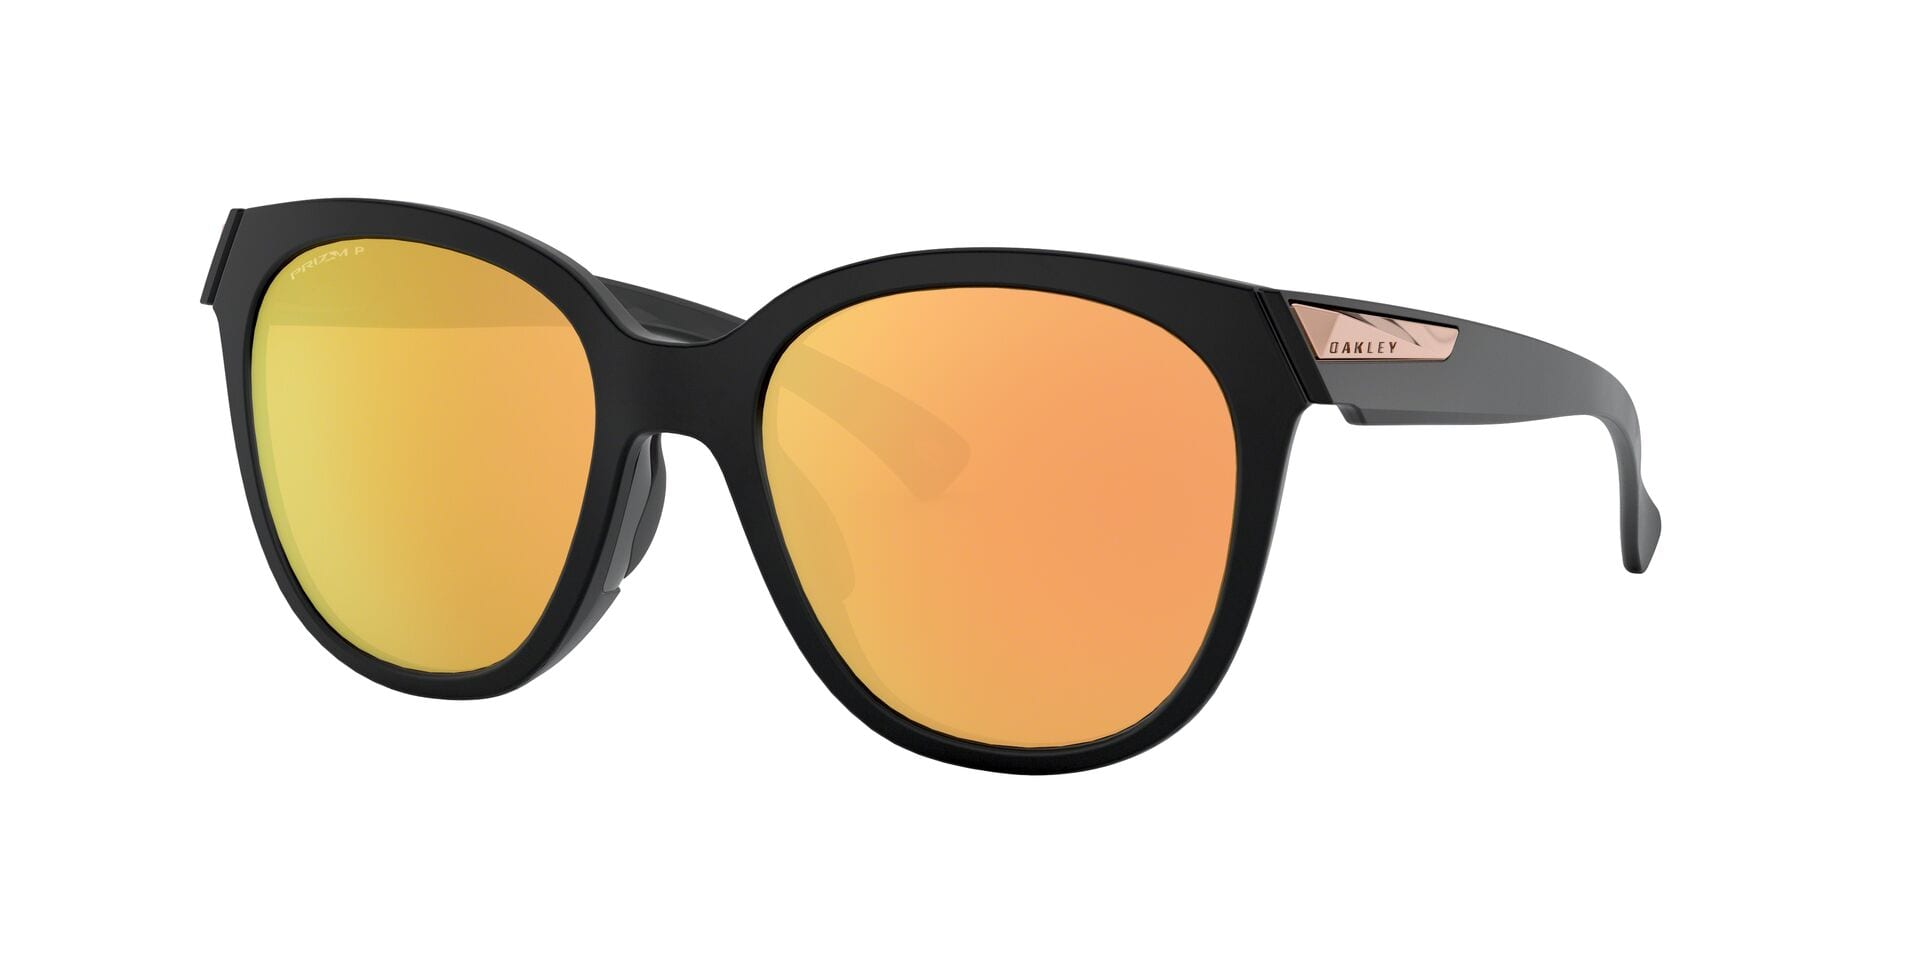 4746f0c059b7 Oakley Low Key Women s Sunglasses - ADS Lifestyle